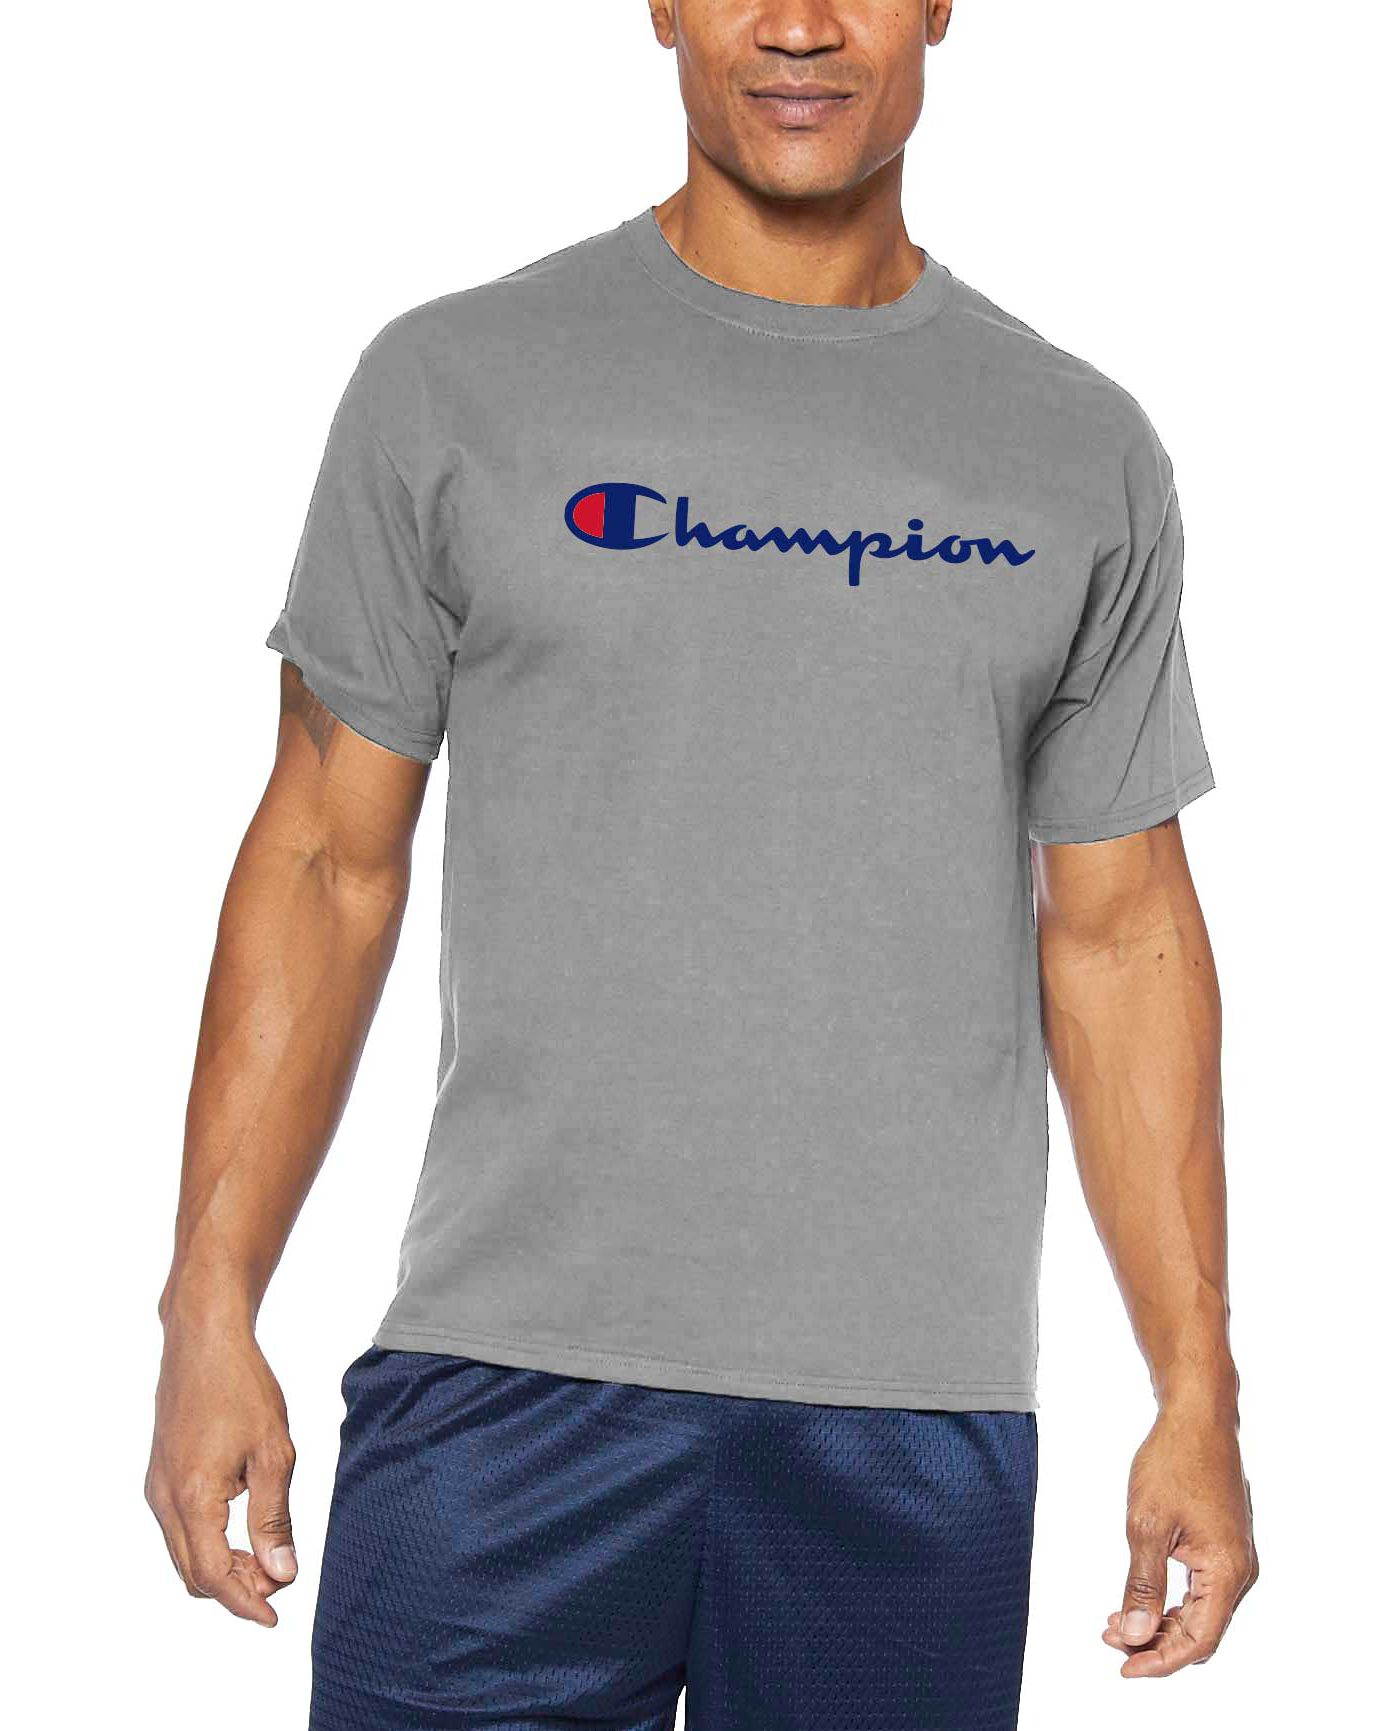 Champion Men's Big & Tall Script Graphic Tee